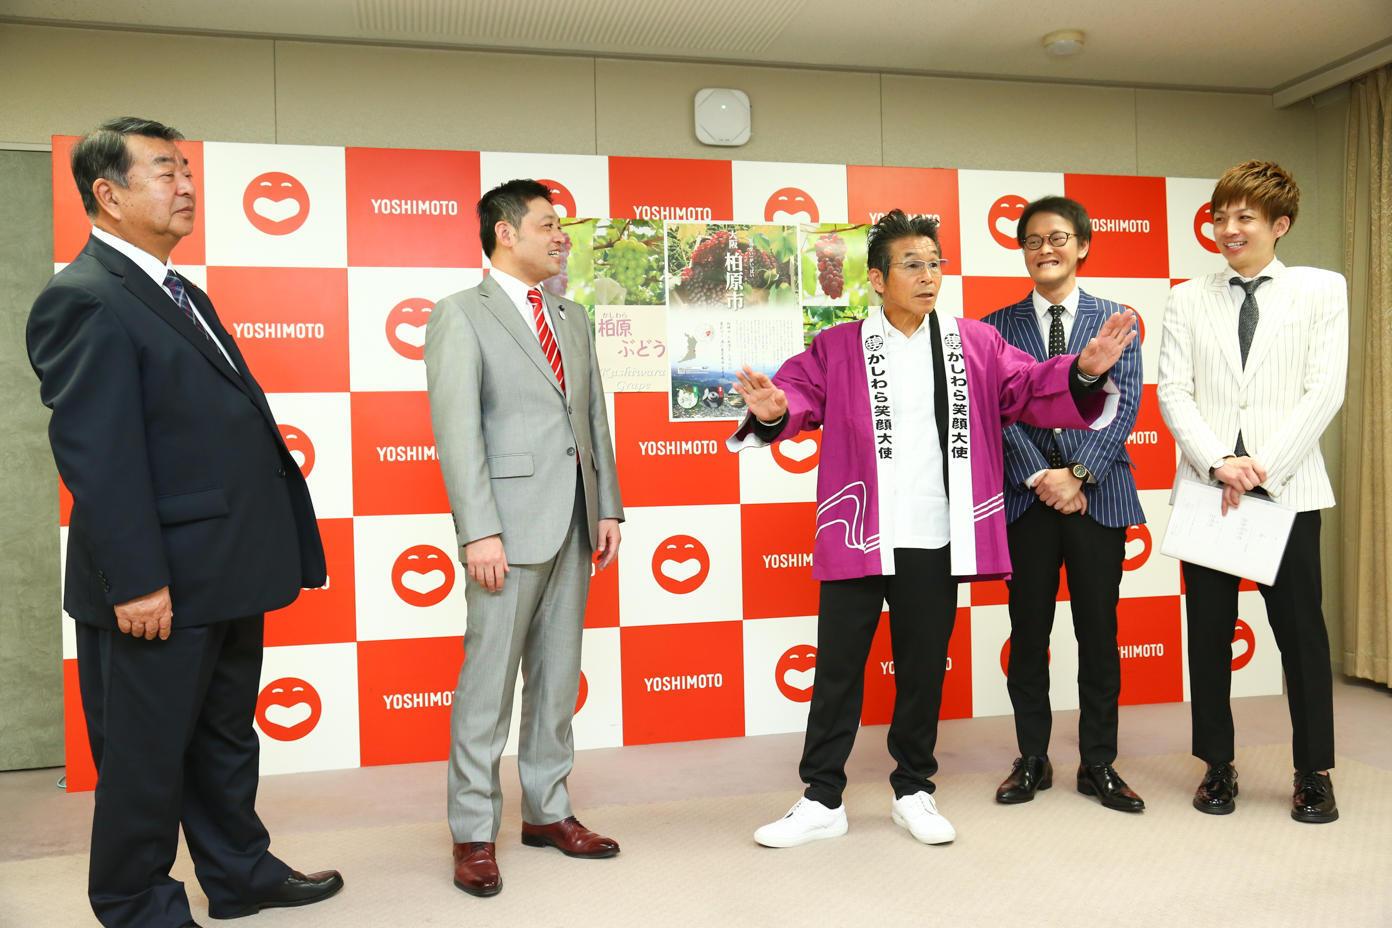 http://news.yoshimoto.co.jp/20171130213151-9d38ce475aea3a83e980dc6938d696a0c270fa73.jpg